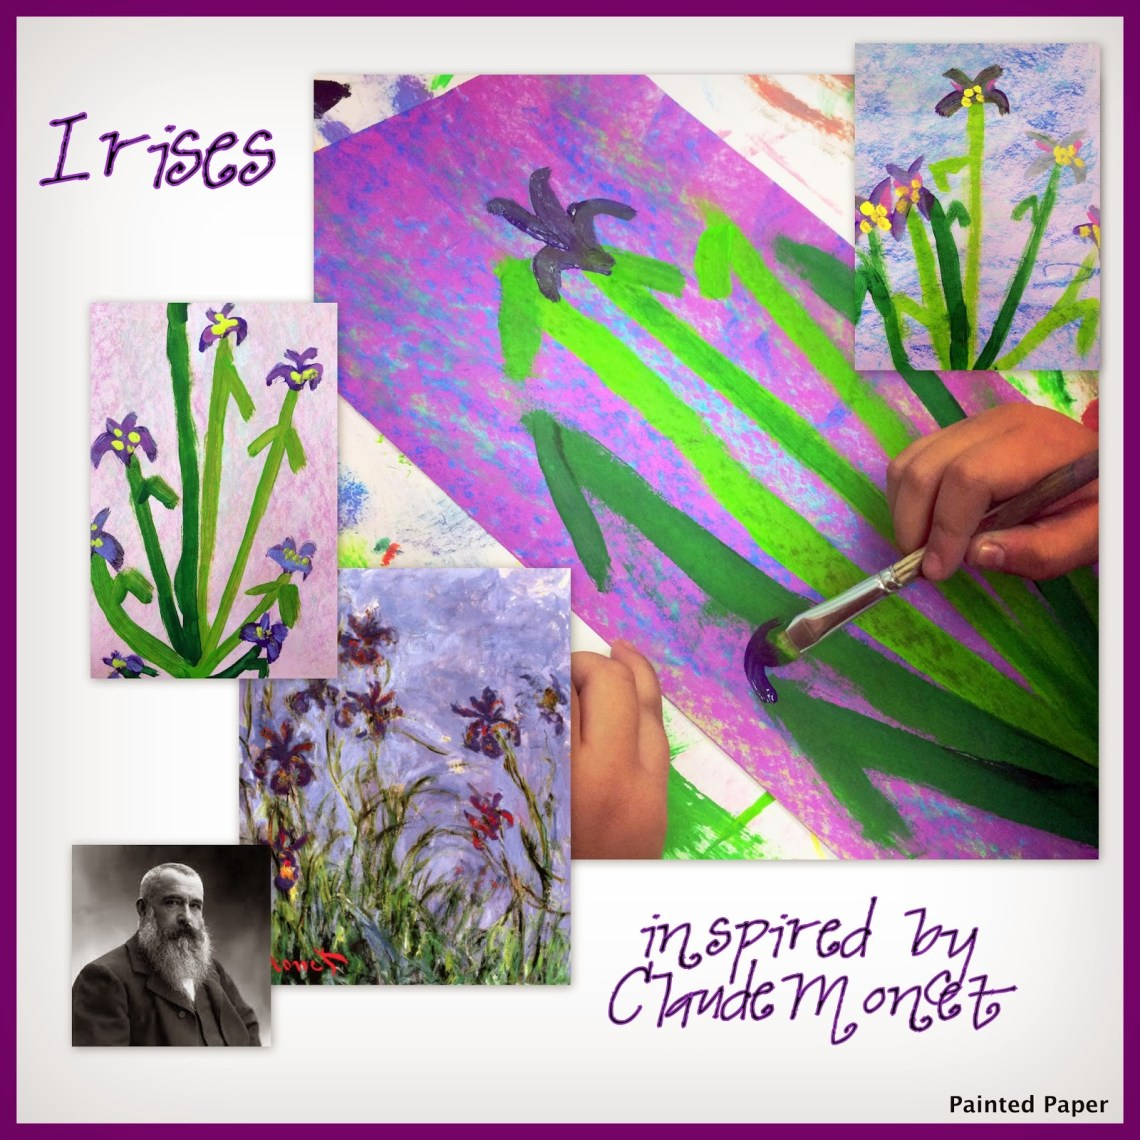 irises2-001